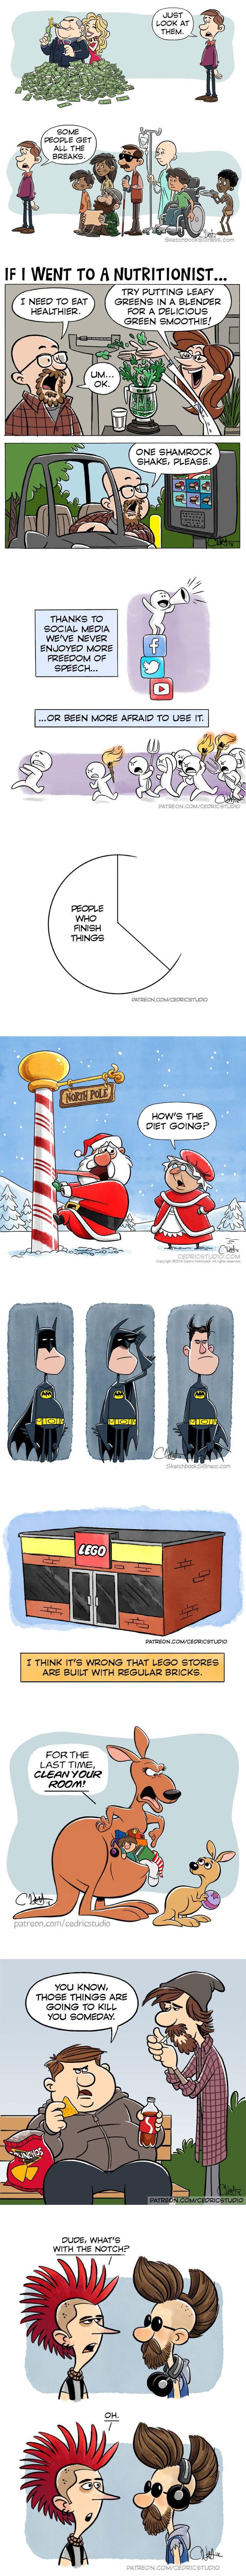 My Most Popular Cartoons of 2018